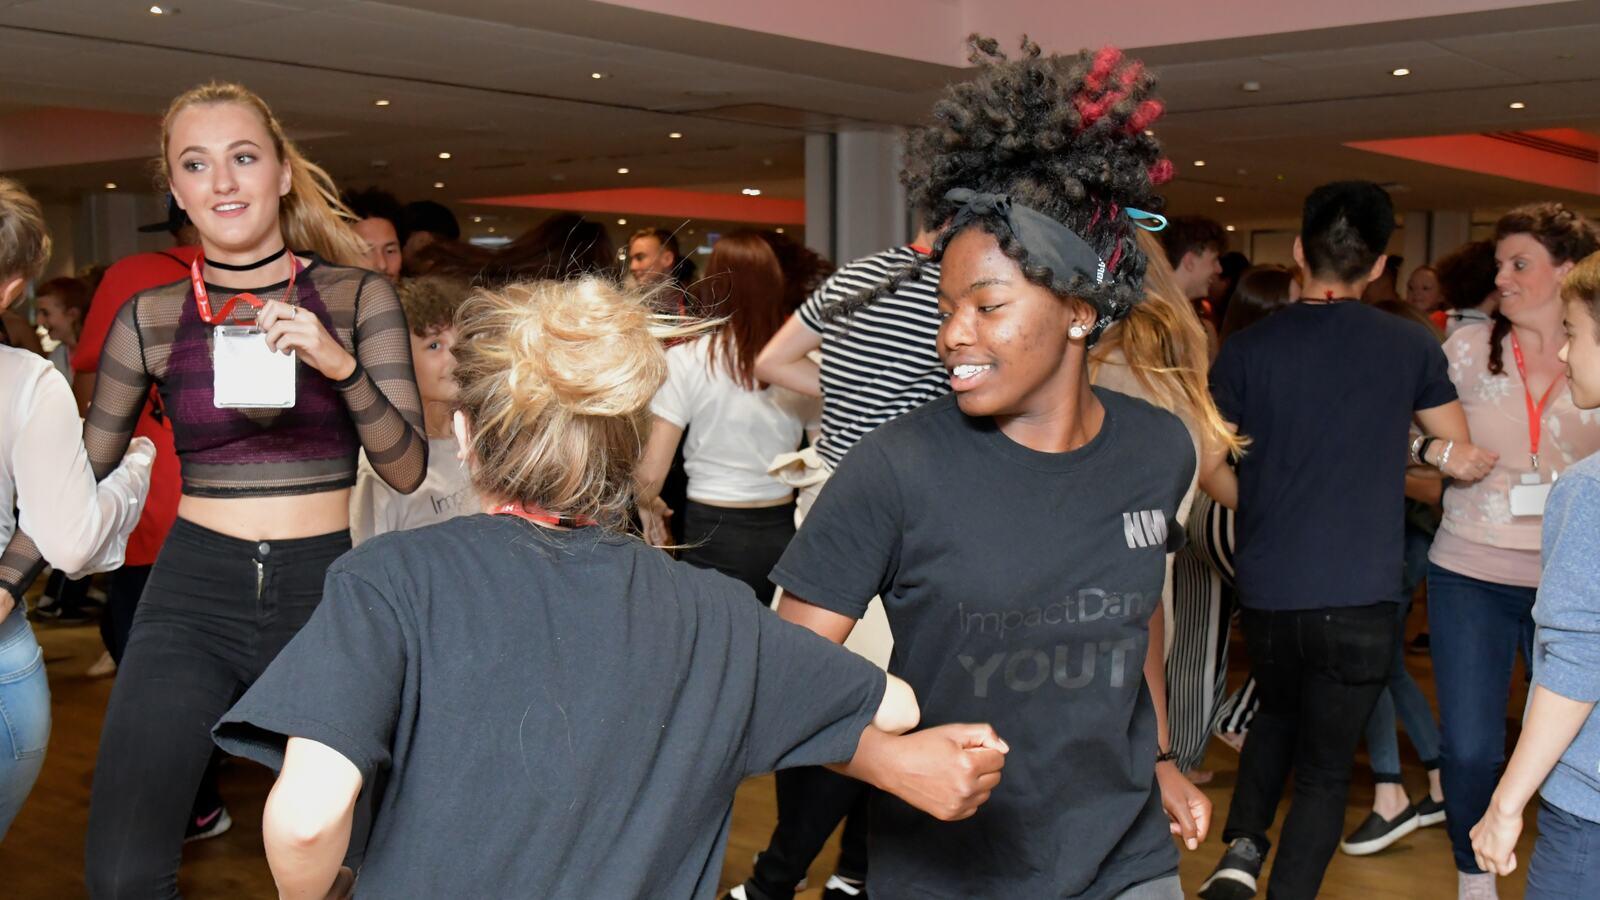 U Dance: Youth Dance Ceilidh, ceilidh dancers